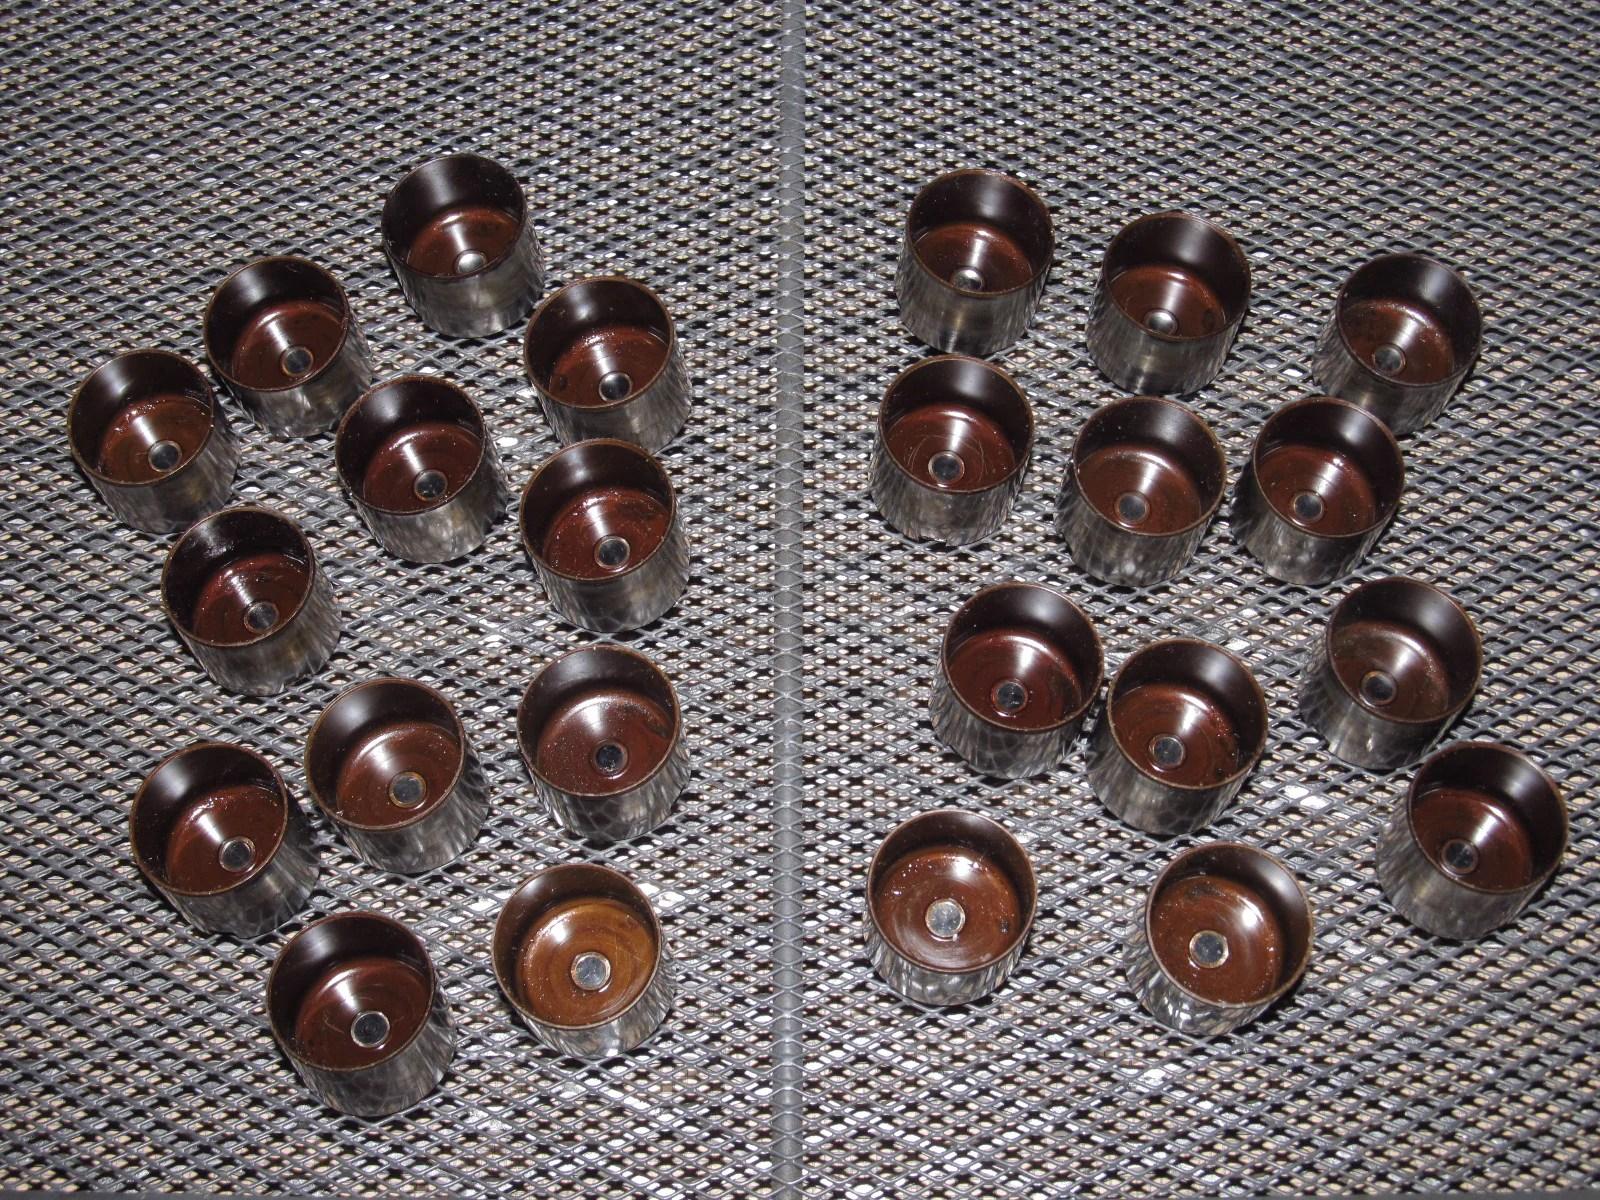 89 90 91 92 toyota supra oem engine cylinder head valve shims cap [ 1600 x 1200 Pixel ]